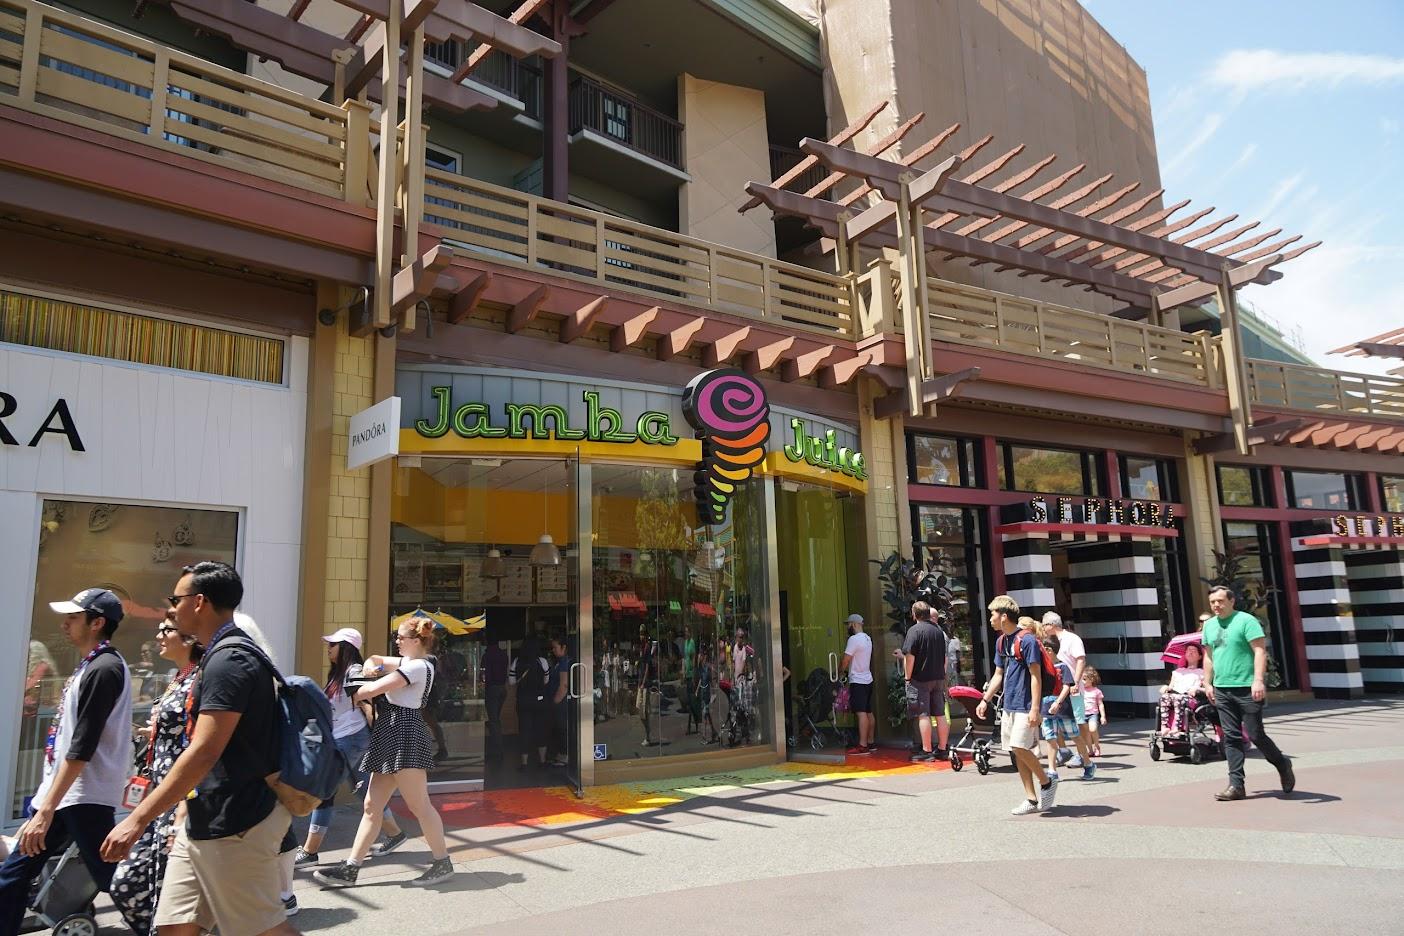 Downtown Disney Jamba Juice